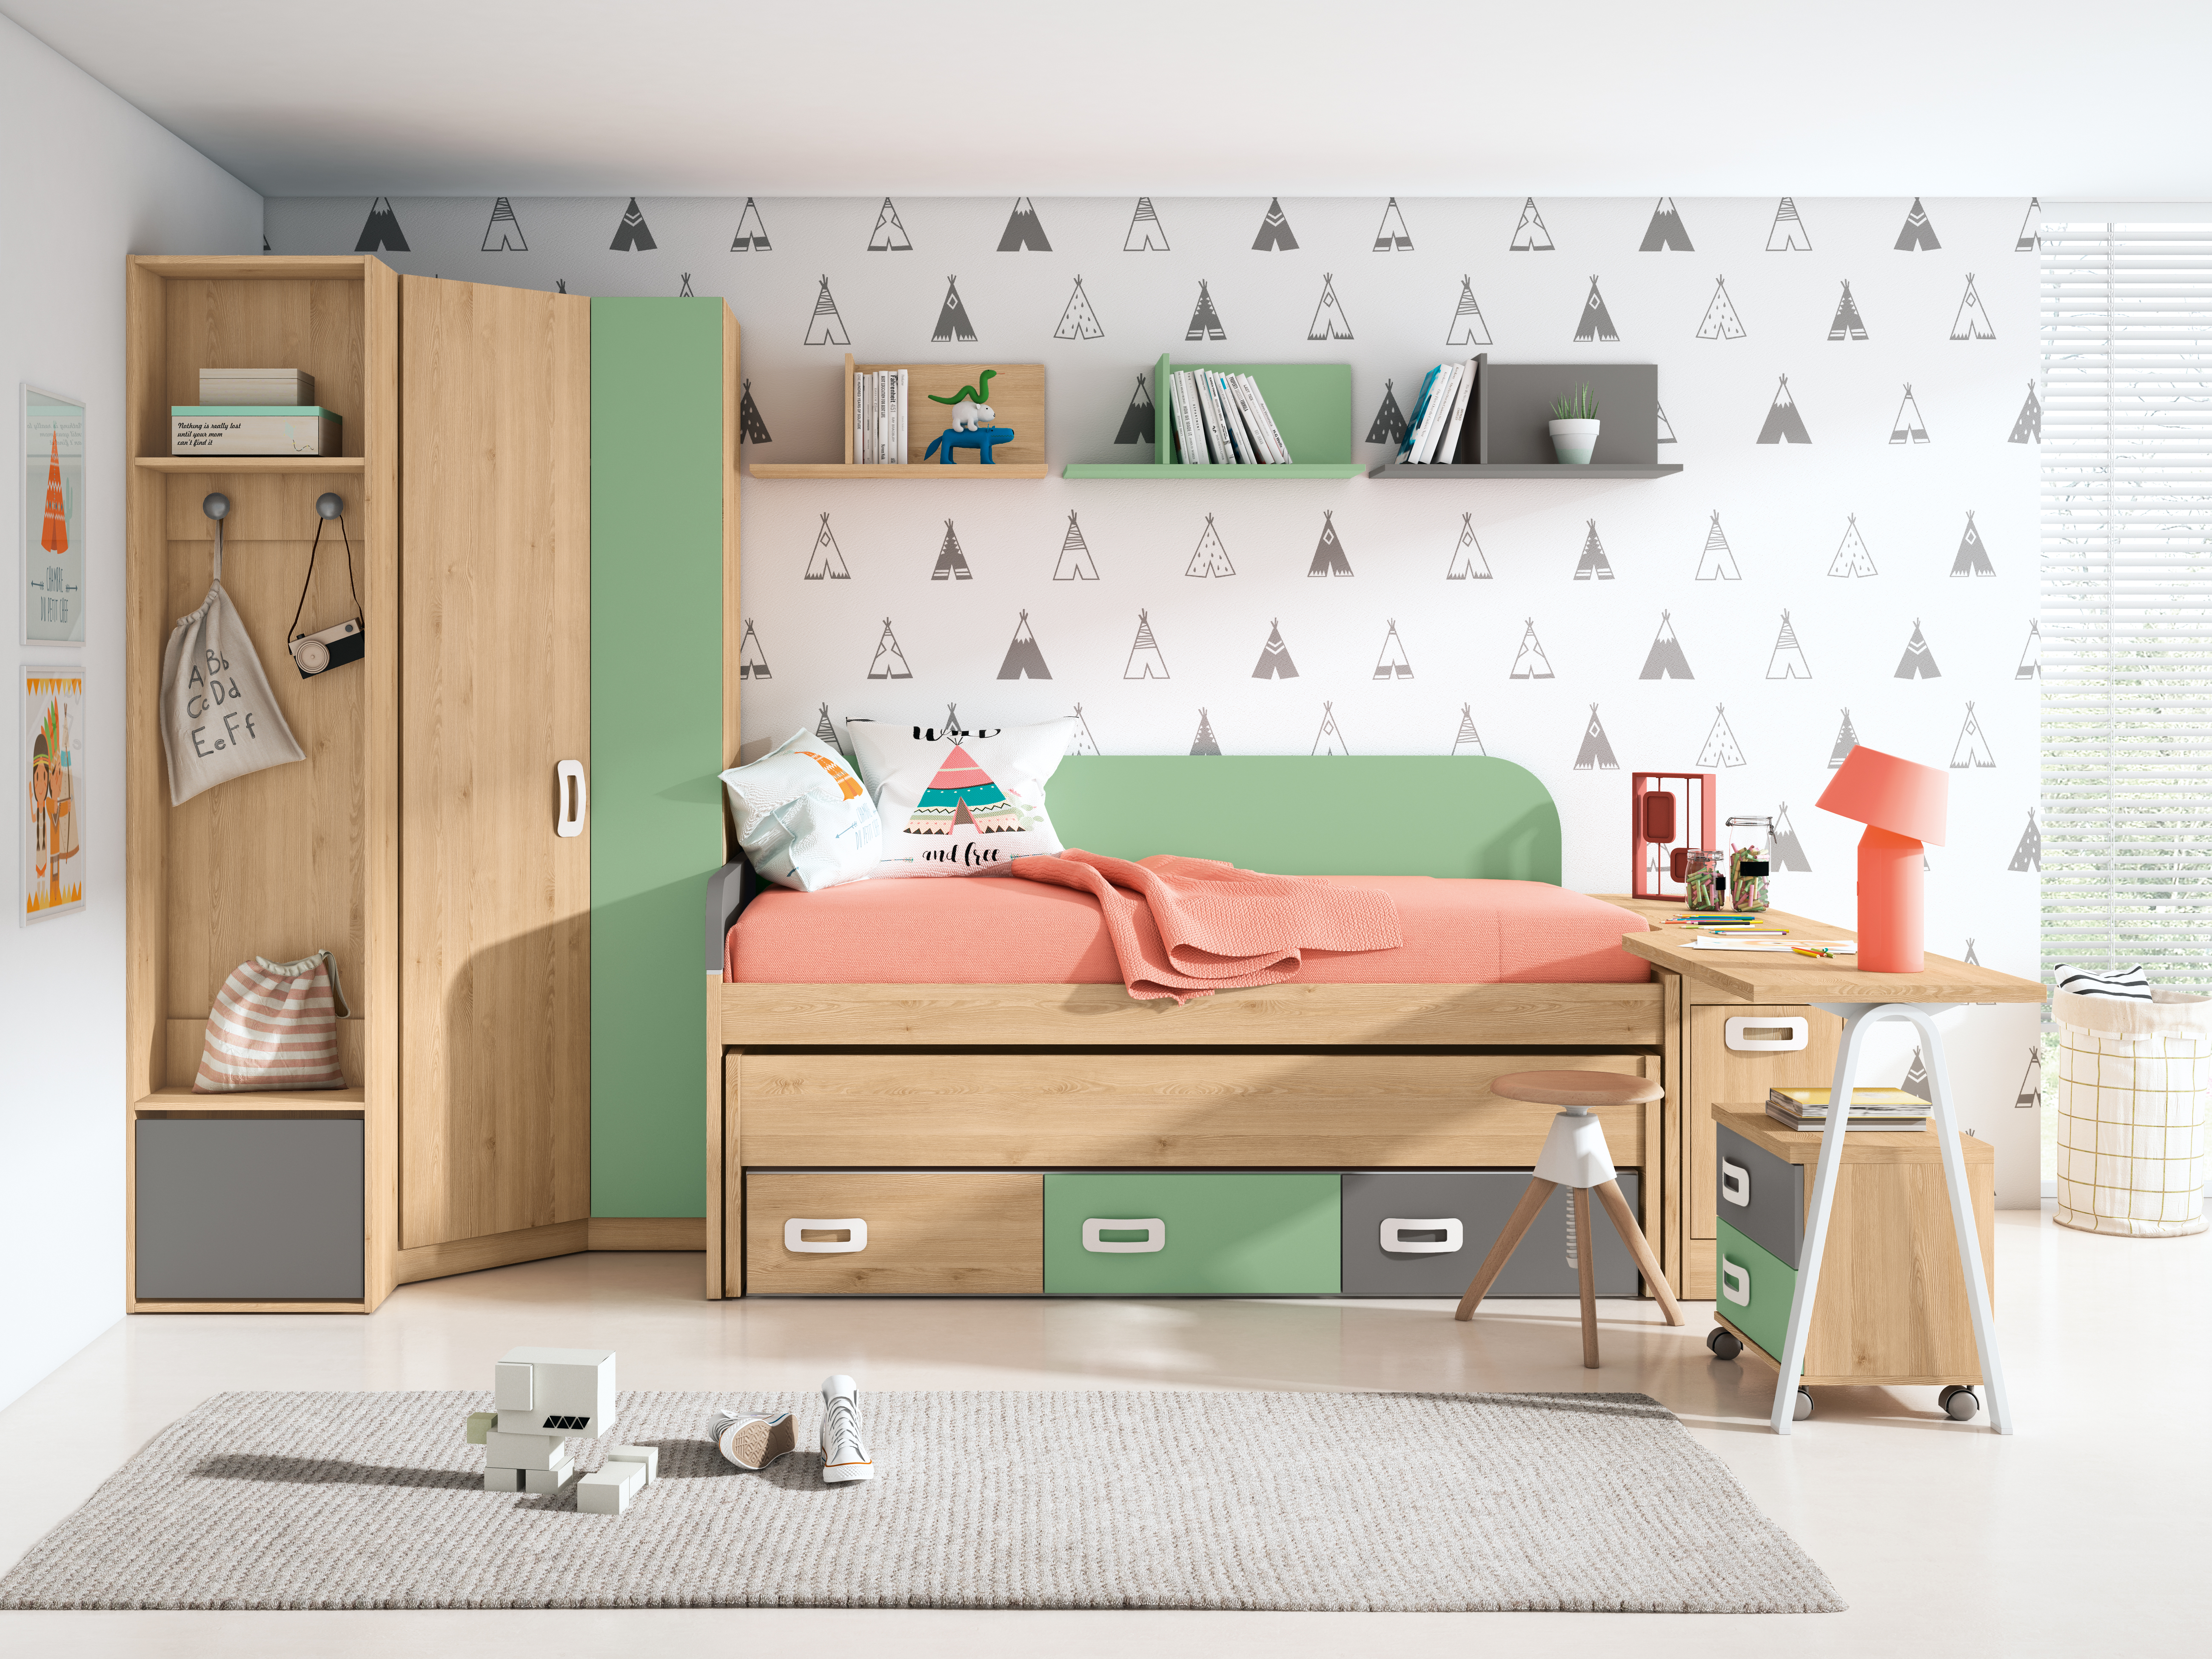 Dormitorio juvenil completo PINO DANÉS - VERDE TALCO - GRIS TORMENTA